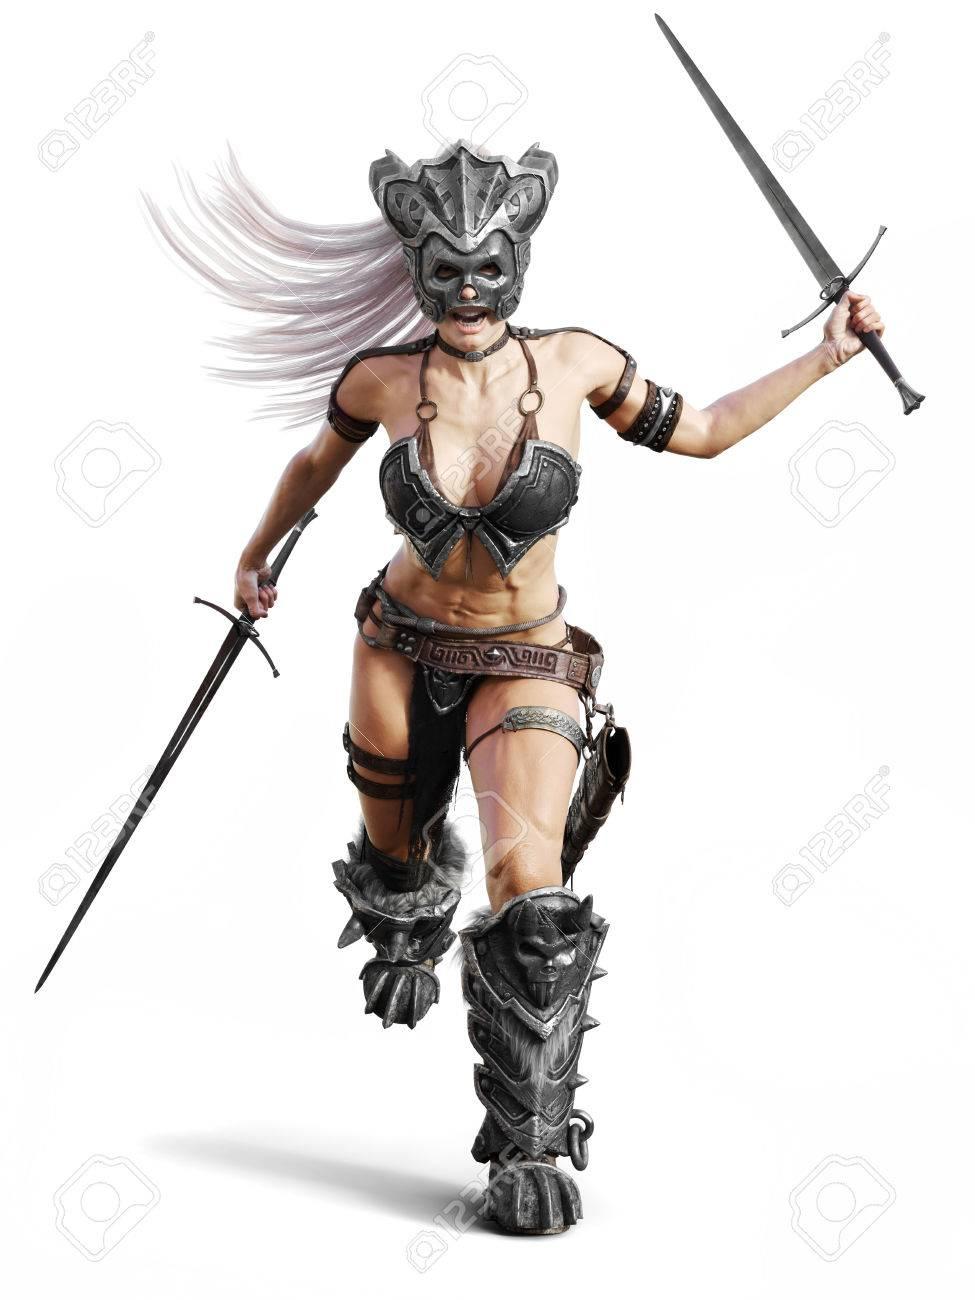 fierce armed female barbarian warrior running into battle on stock